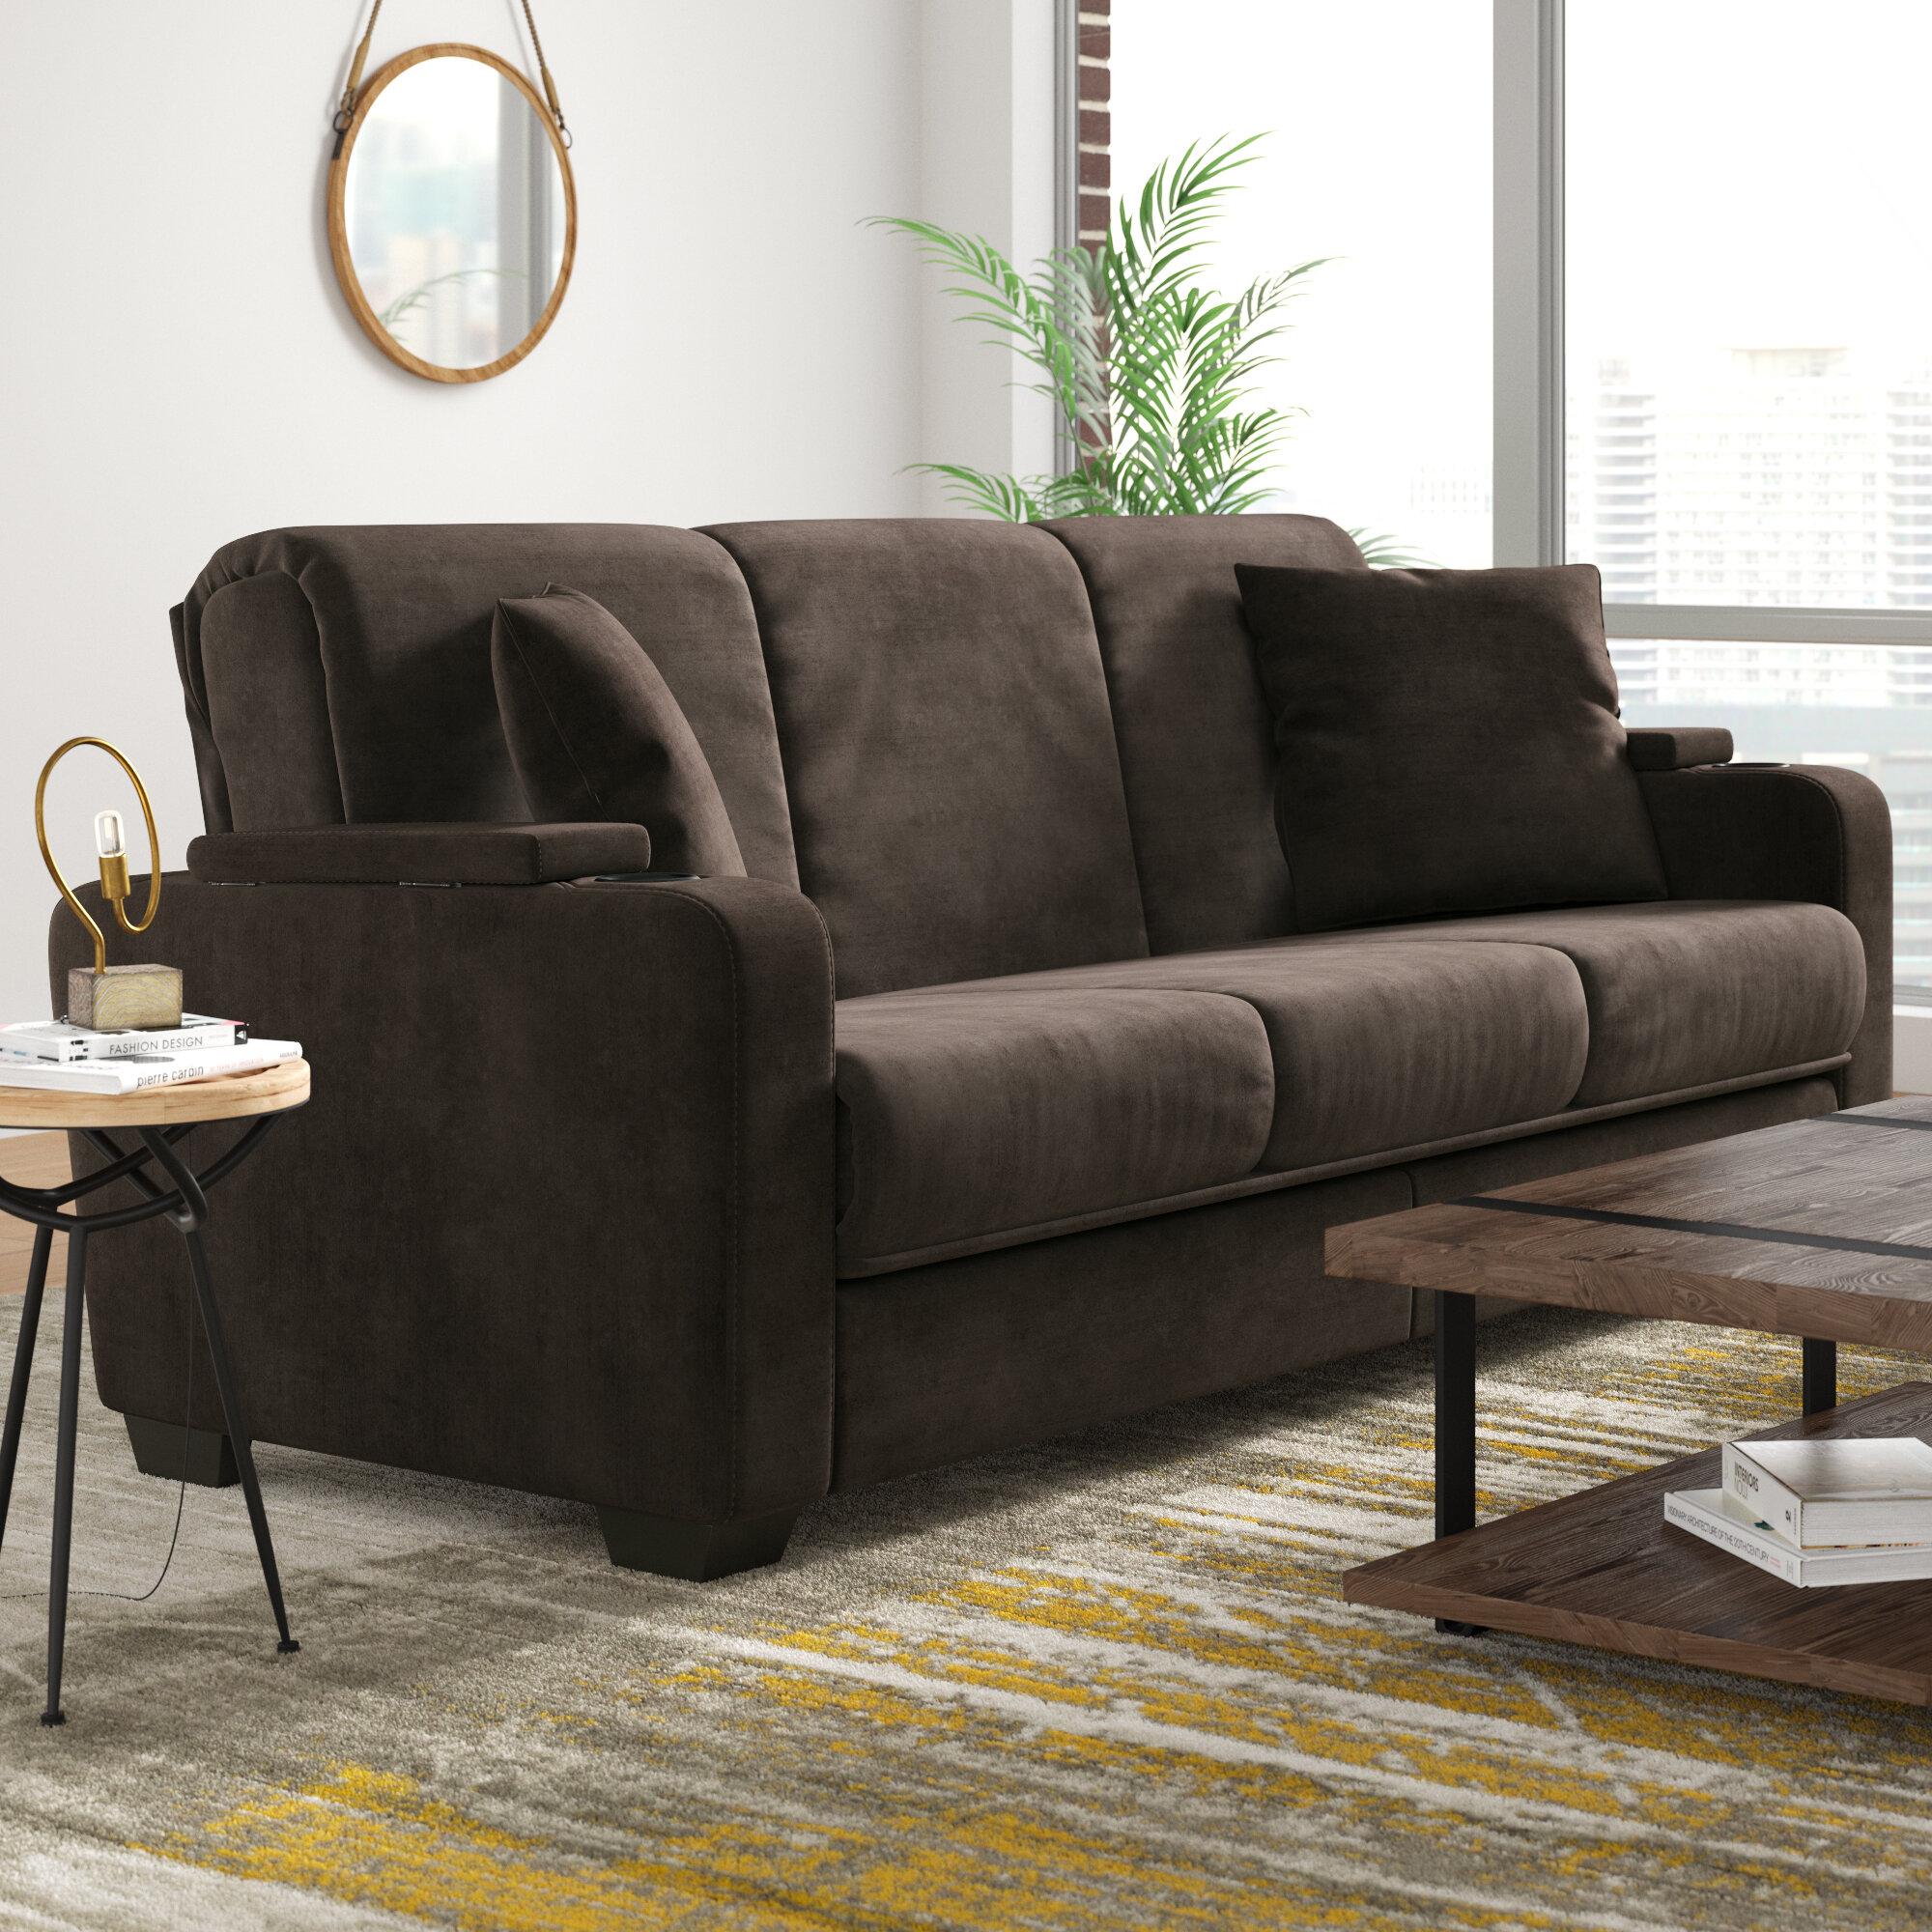 Ciera Convertible Sleeper Sofa